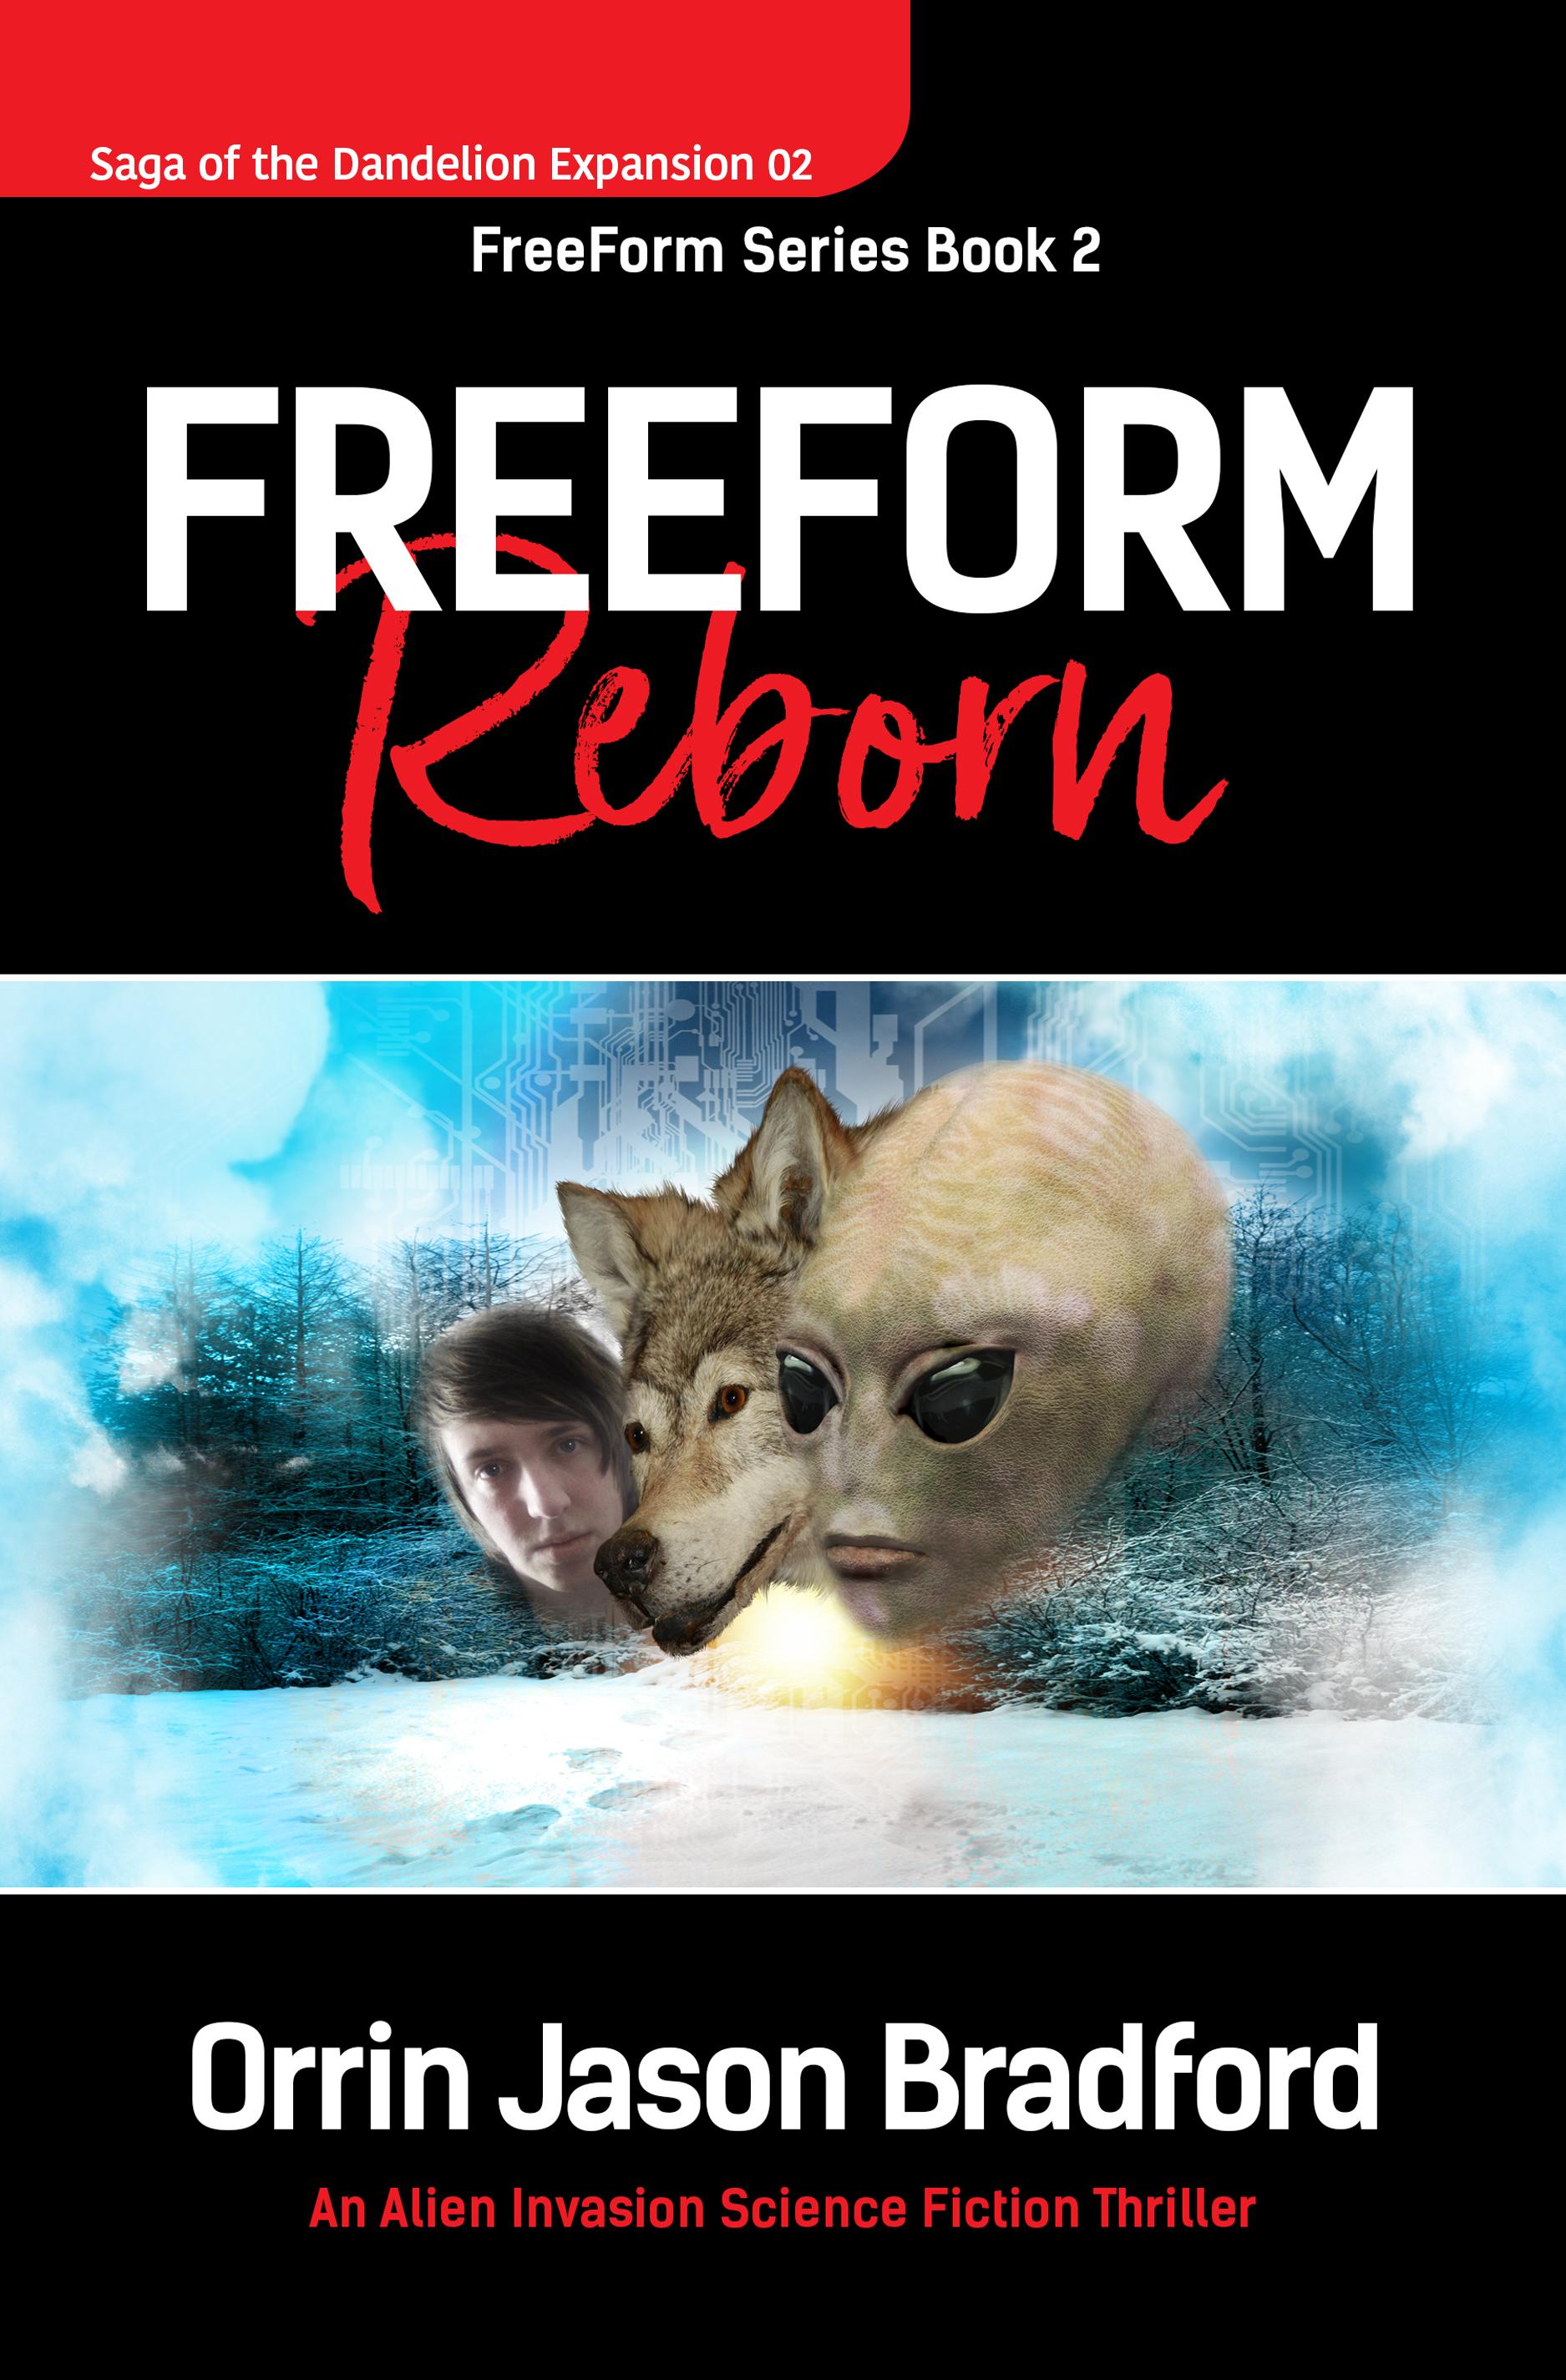 FreeForm Reborn